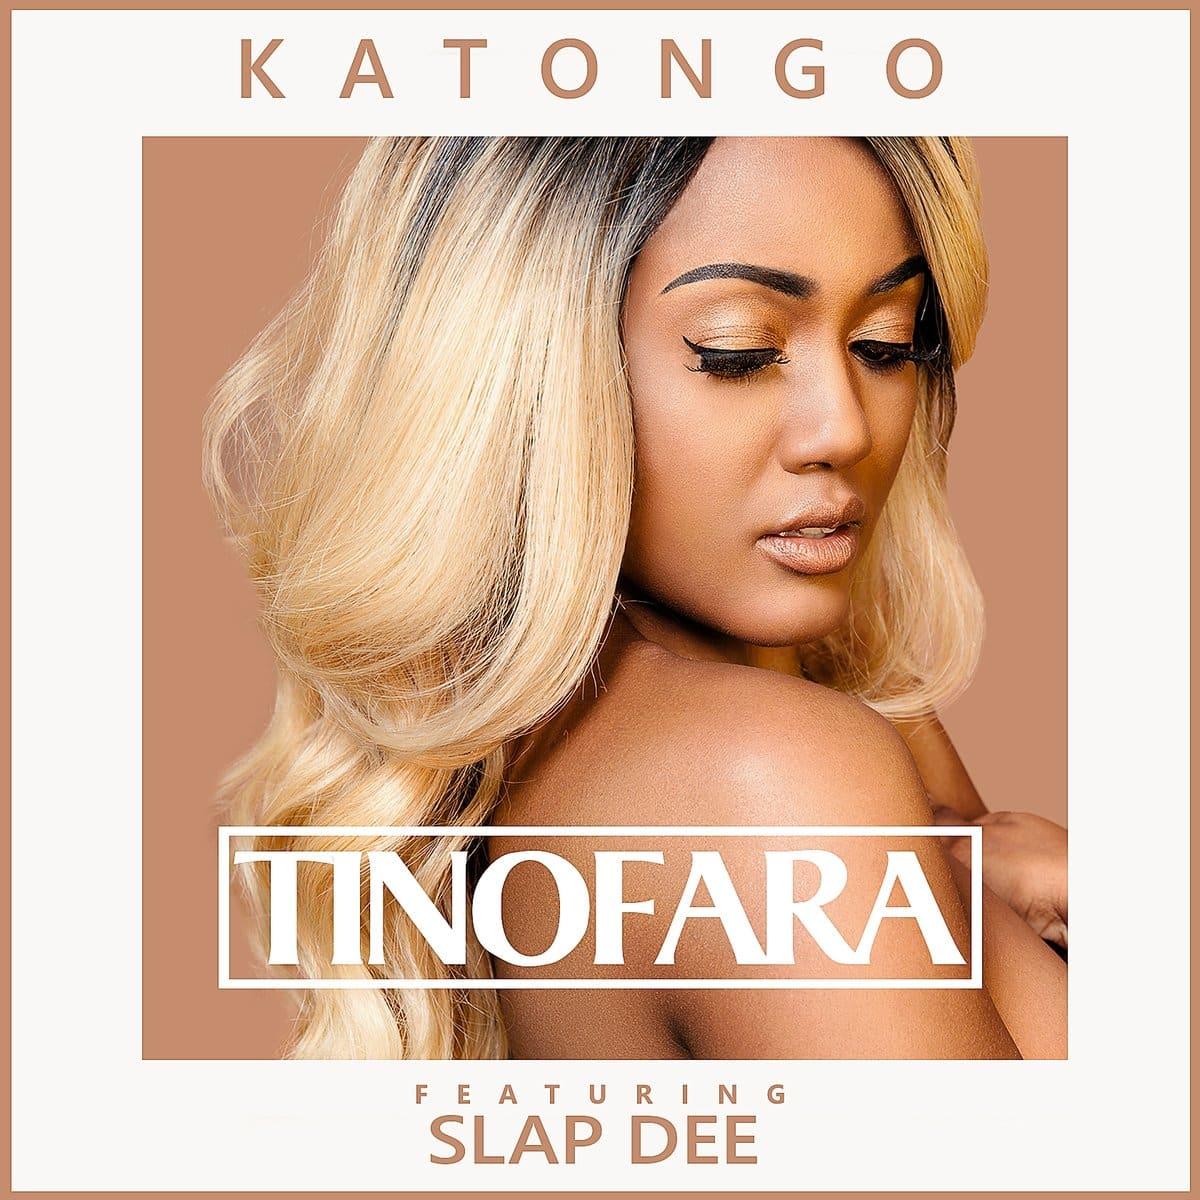 Katongo Temba Ft. Slap Dee Tinofara